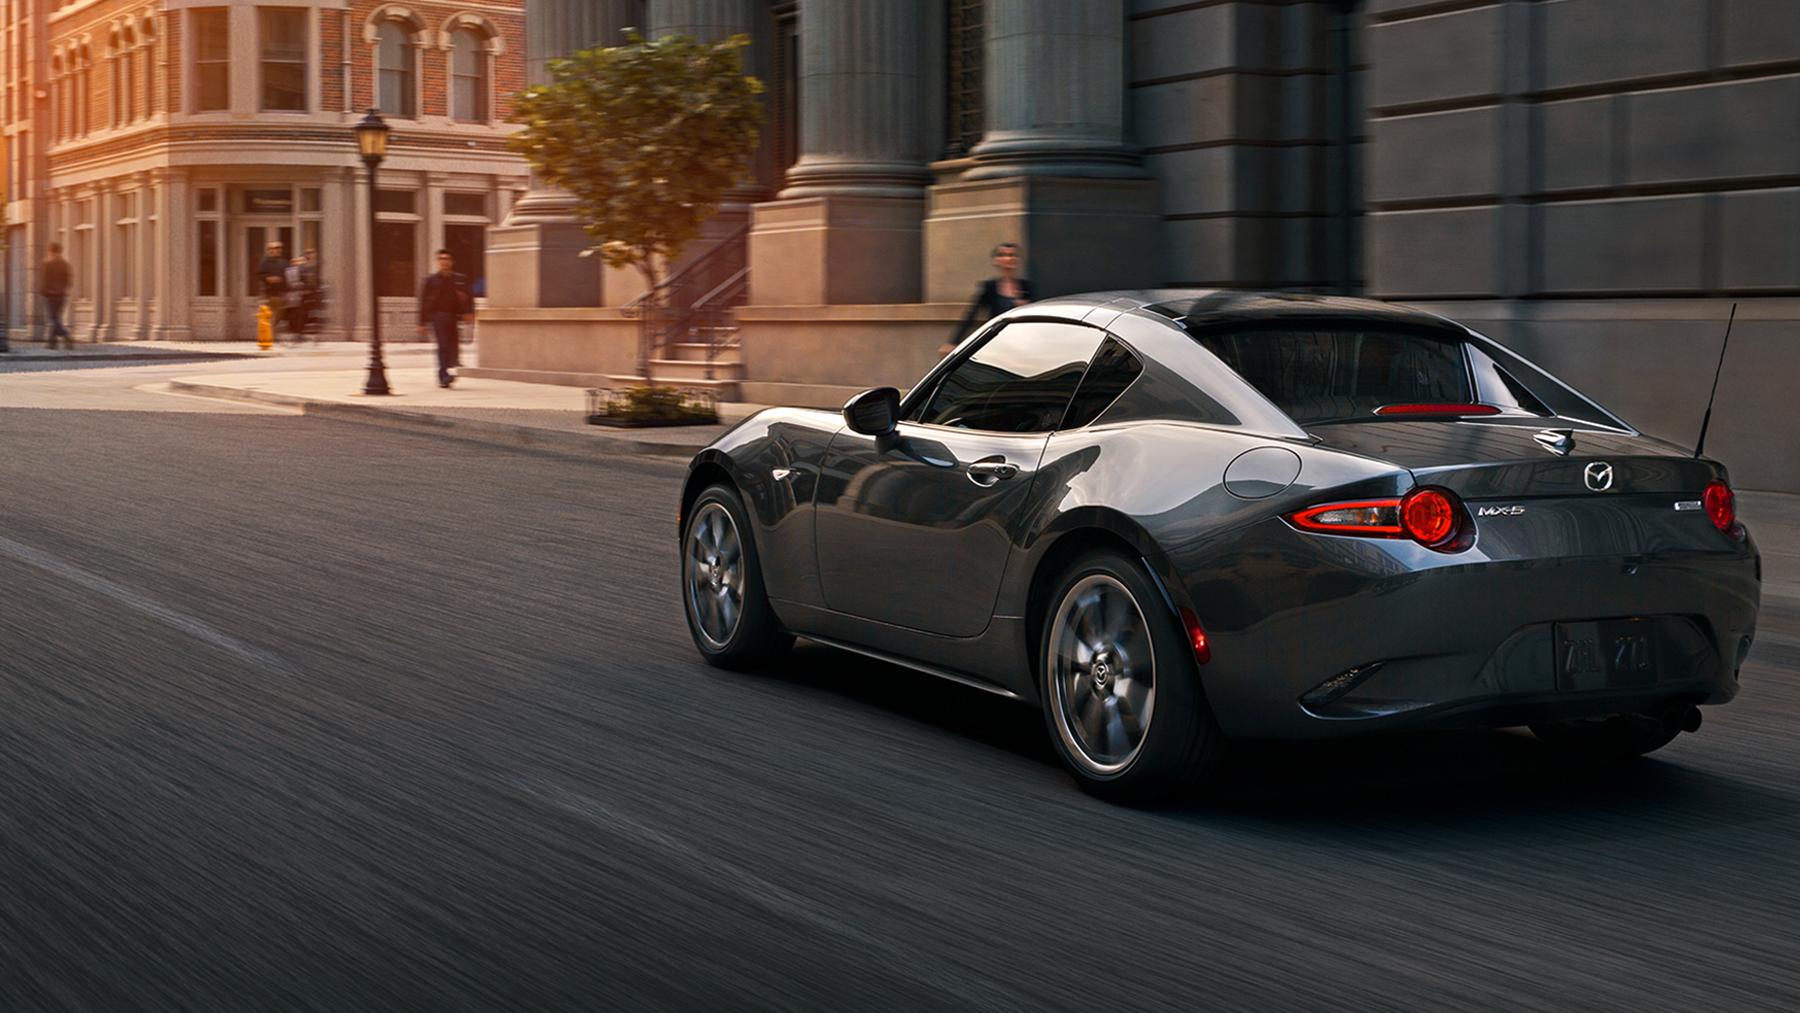 2020 Mazda Miata Engine